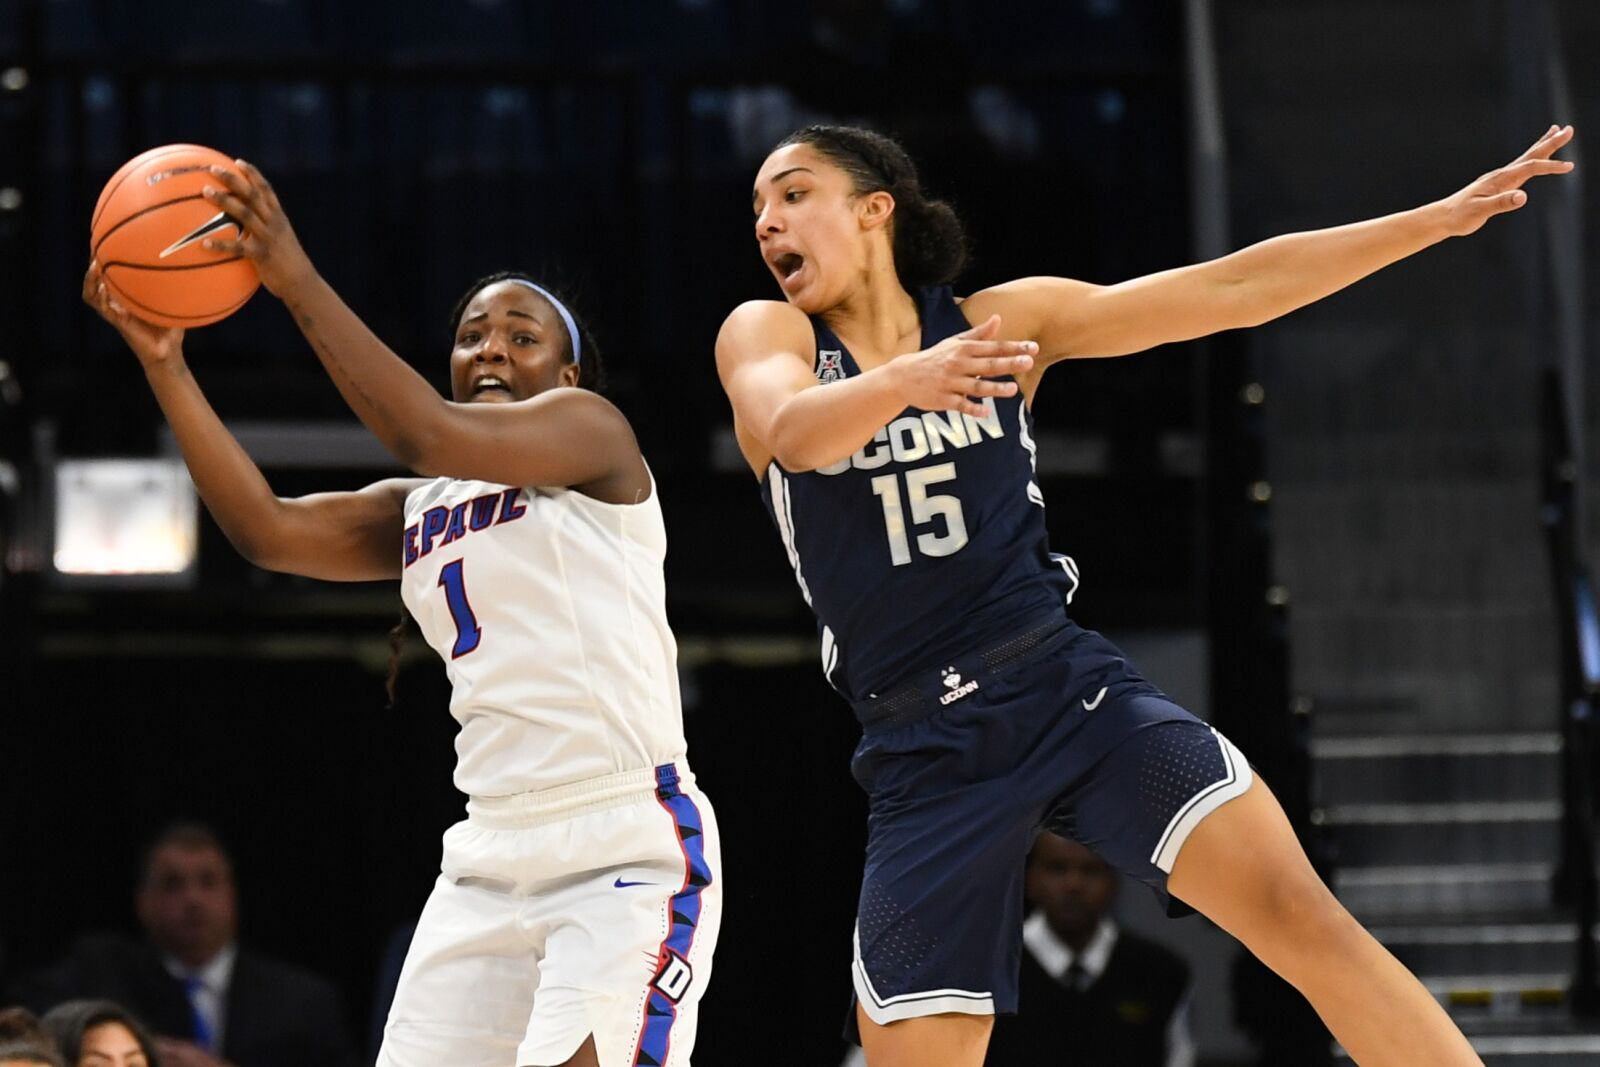 WNBA News: Chicago Sky Waive DePaul Guard Ashton Millender